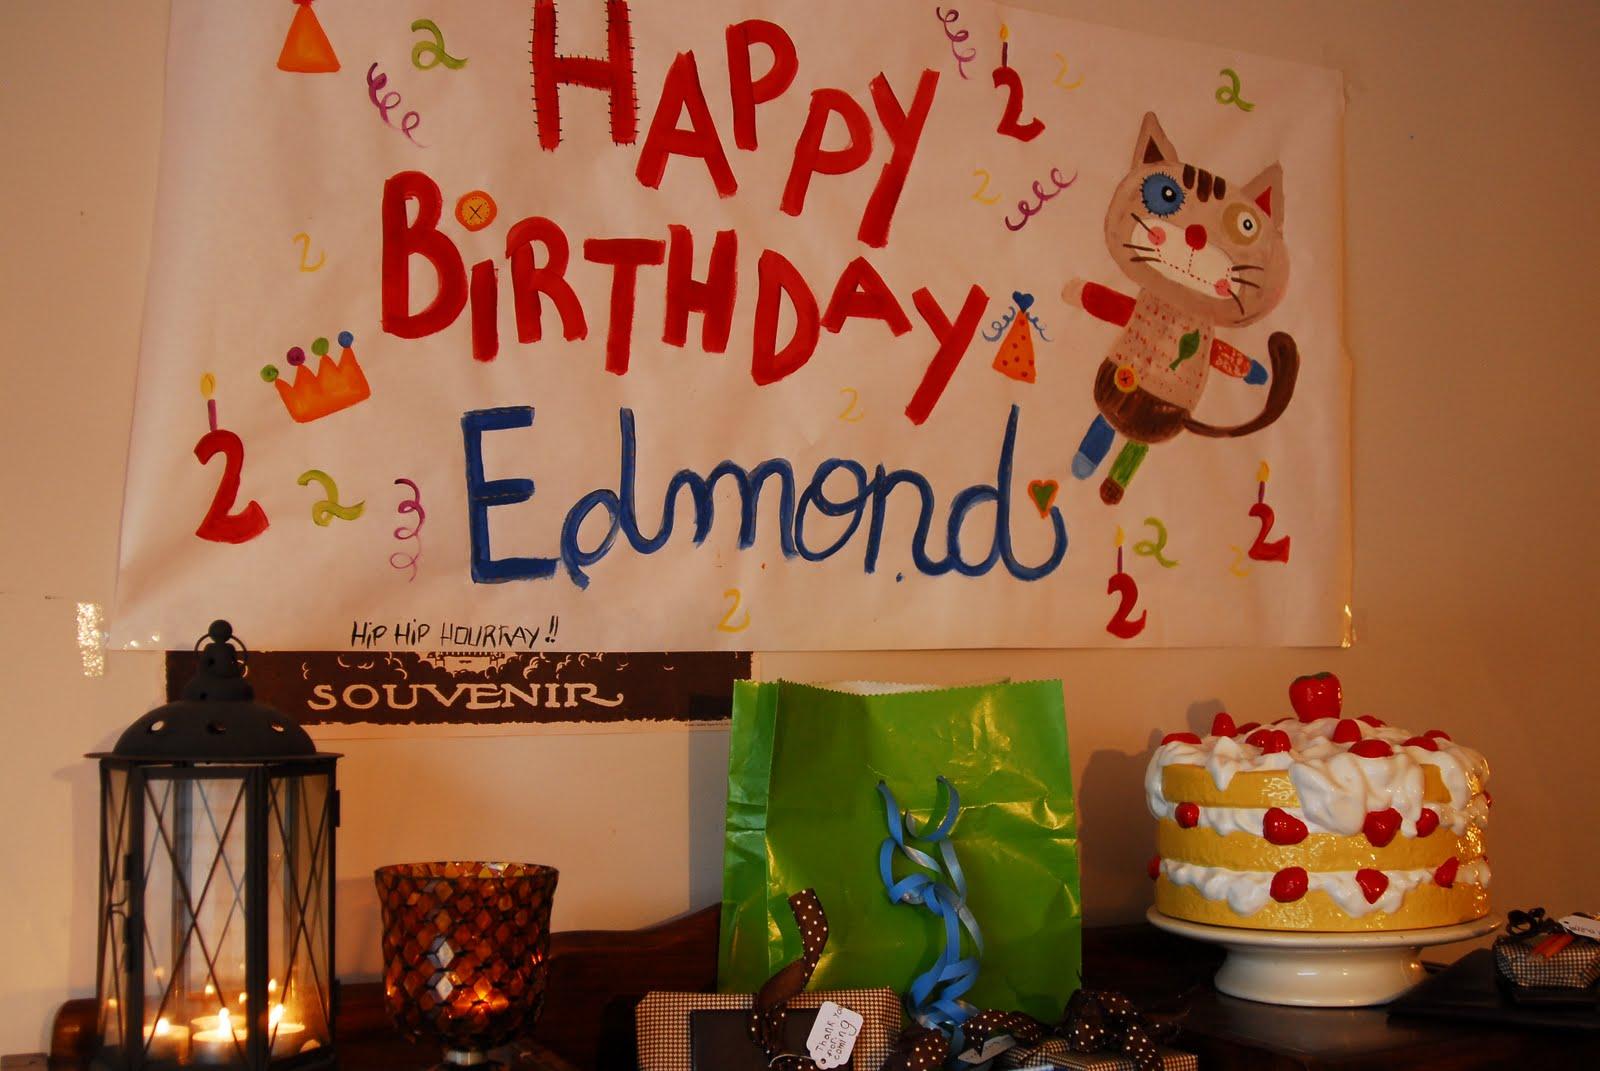 edmund chat Polemic chat [edmund m dunne] on amazoncom free shipping on qualifying offers.